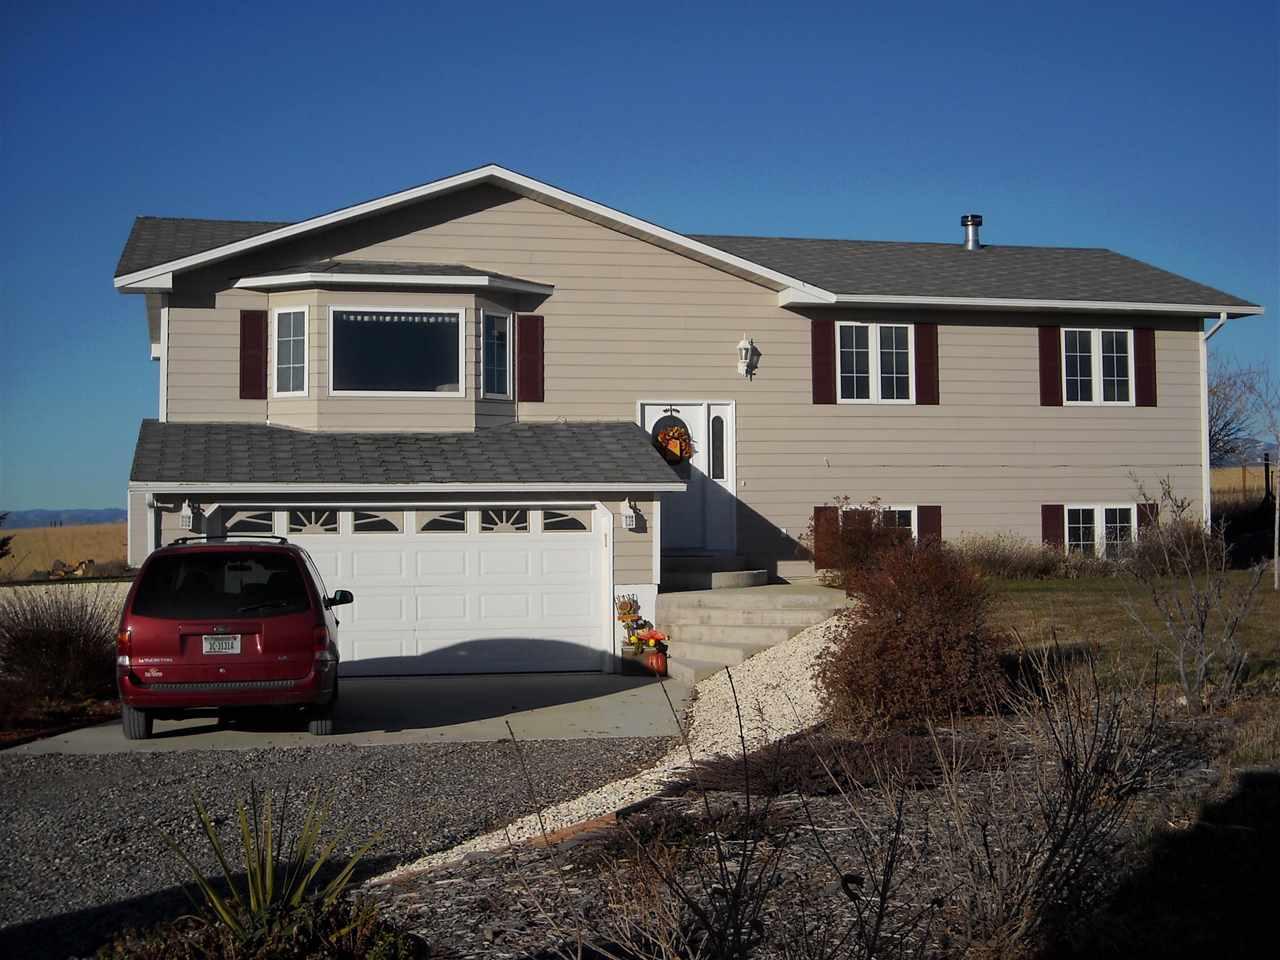 1 Broadwater Rd, Townsend, MT 59644